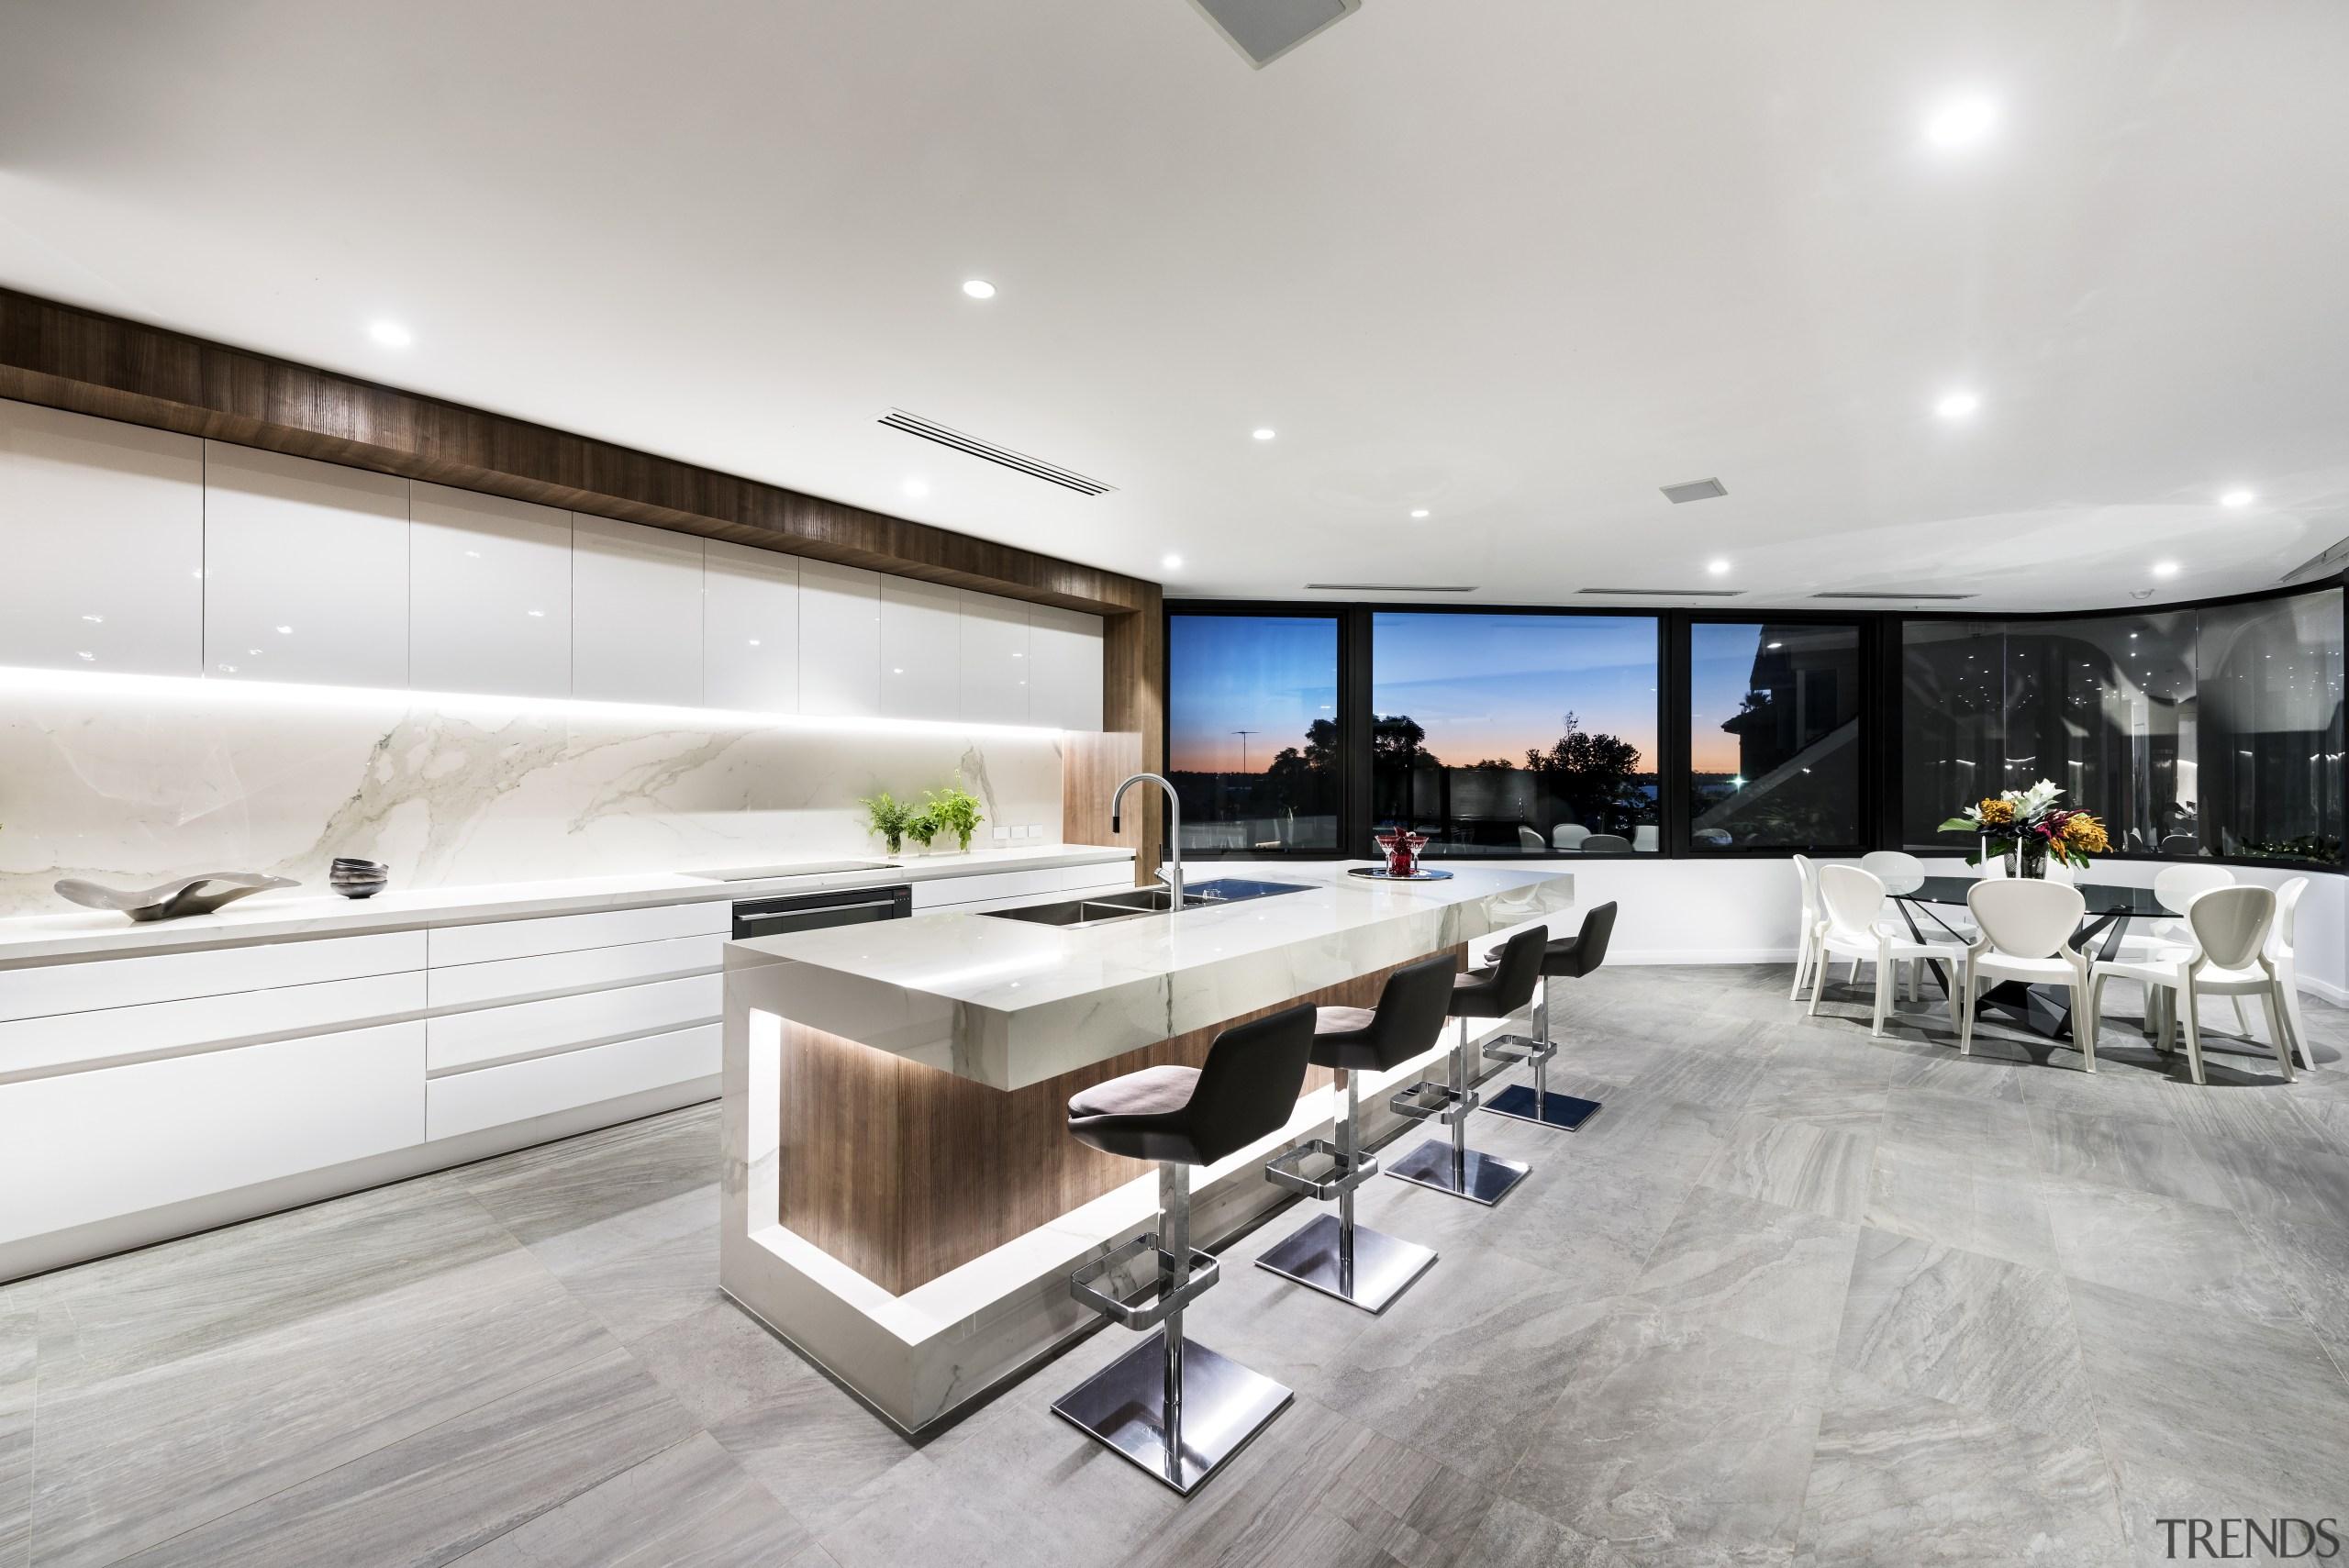 Kitchen plus view – contemporary new home by floor, interior design, kitchen, gray